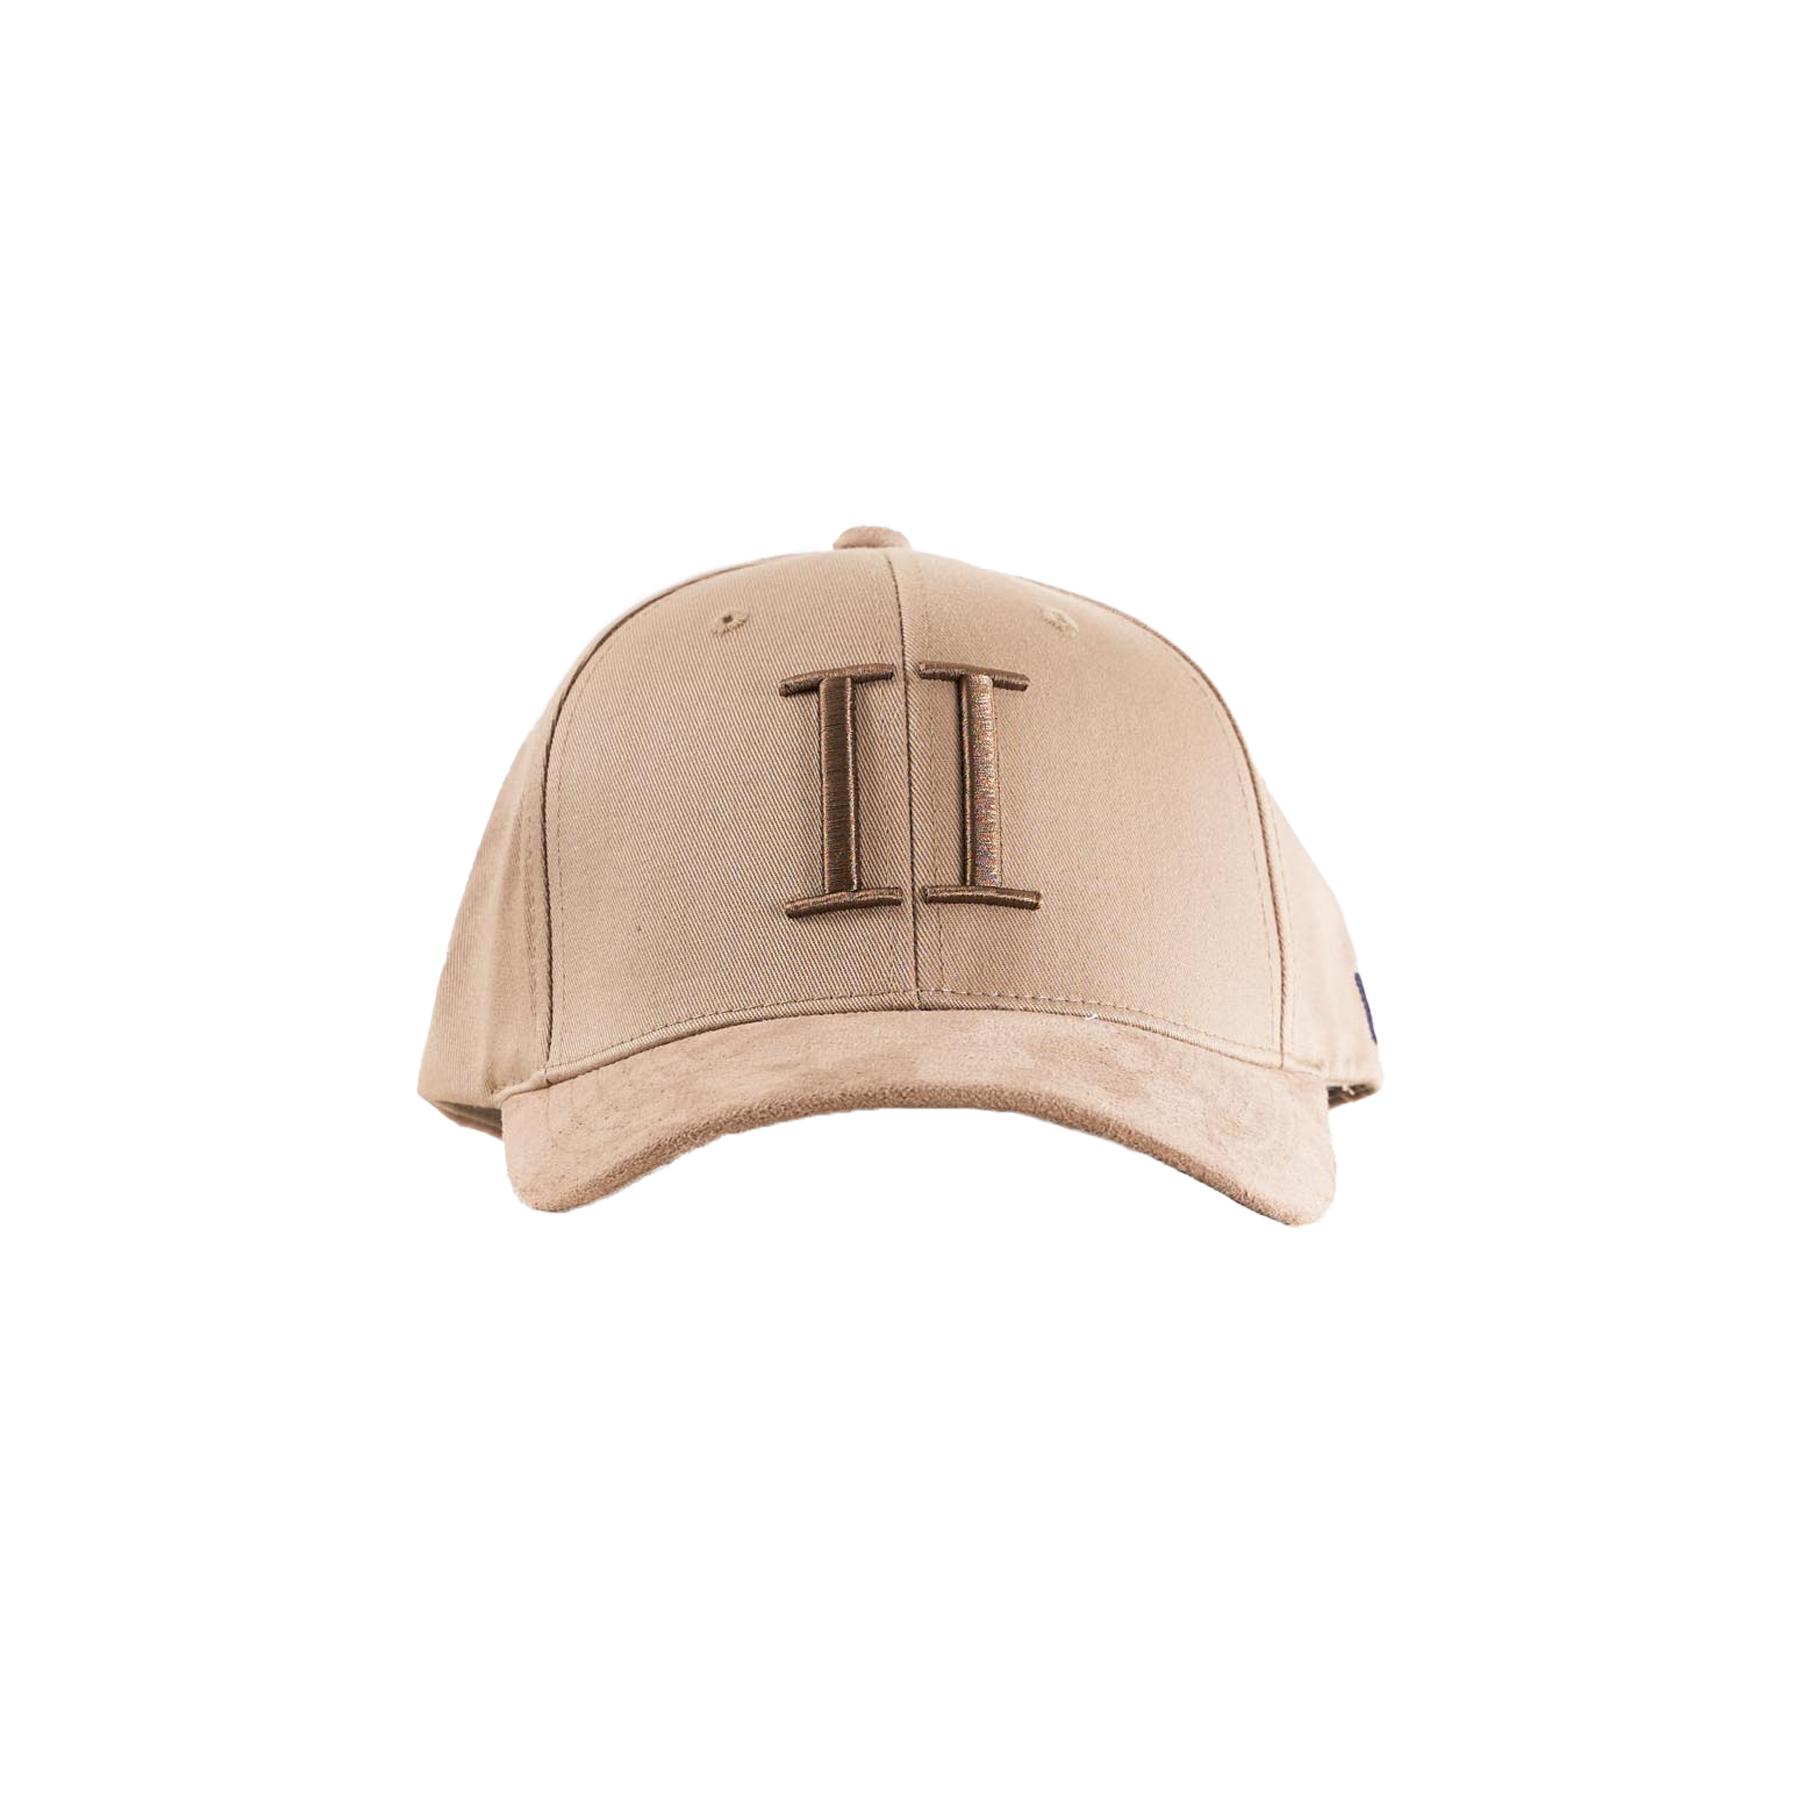 Les Deux - Baseball cap suede - Accessories til herre - 810335-DARK SAND/MOU - ONE S